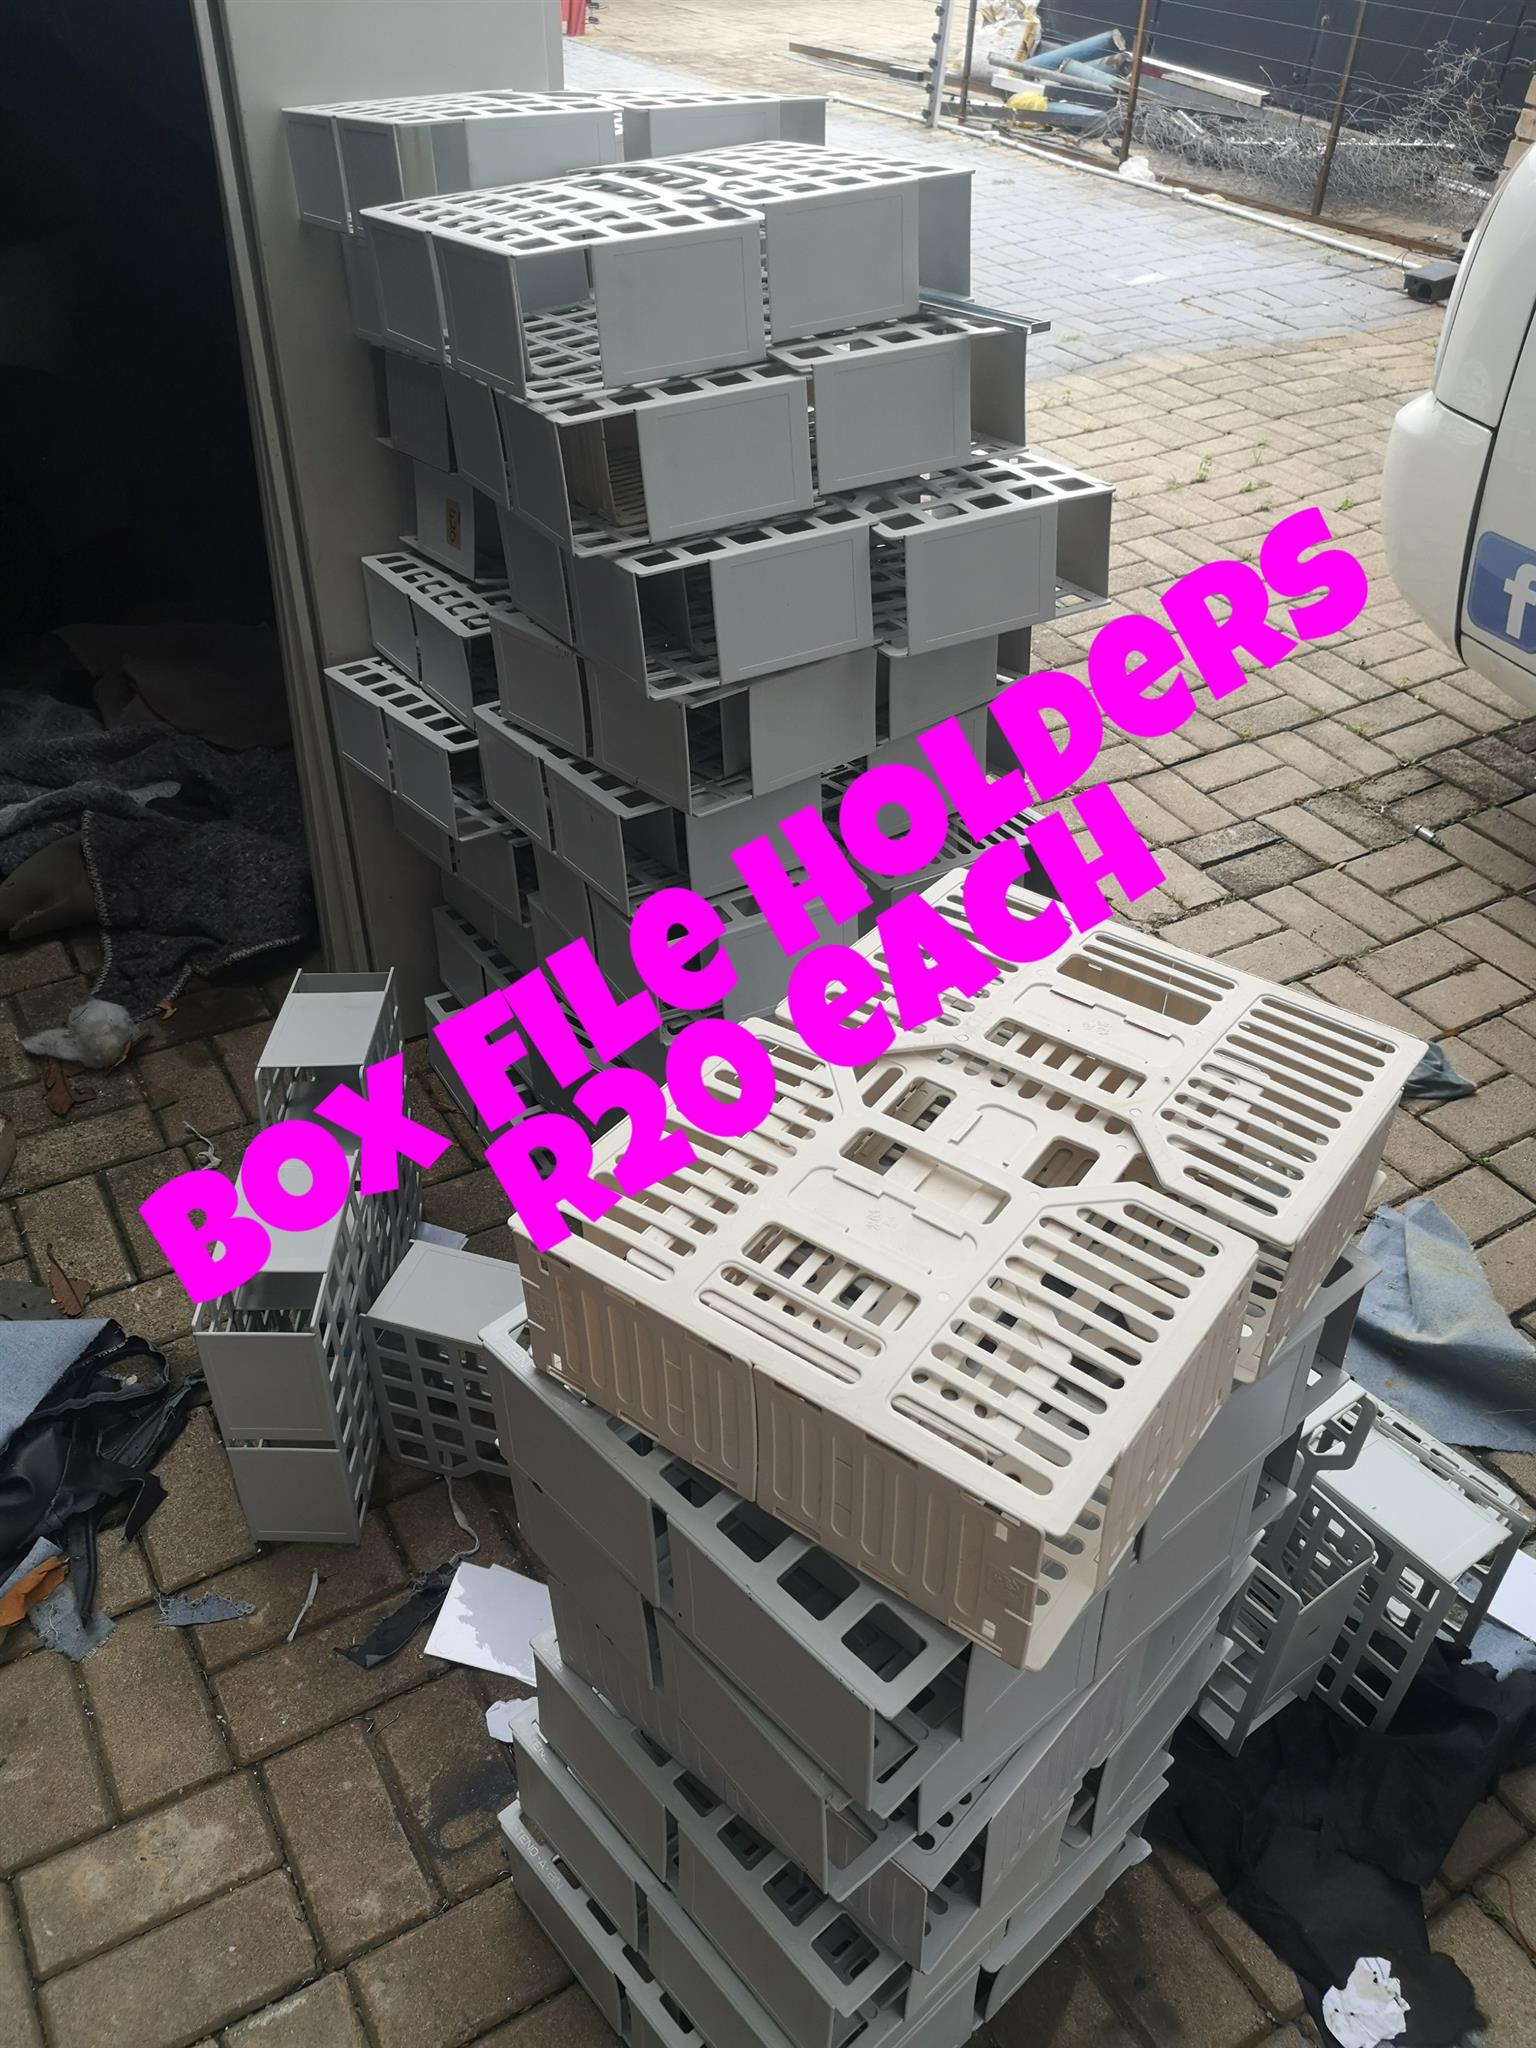 Box file holders